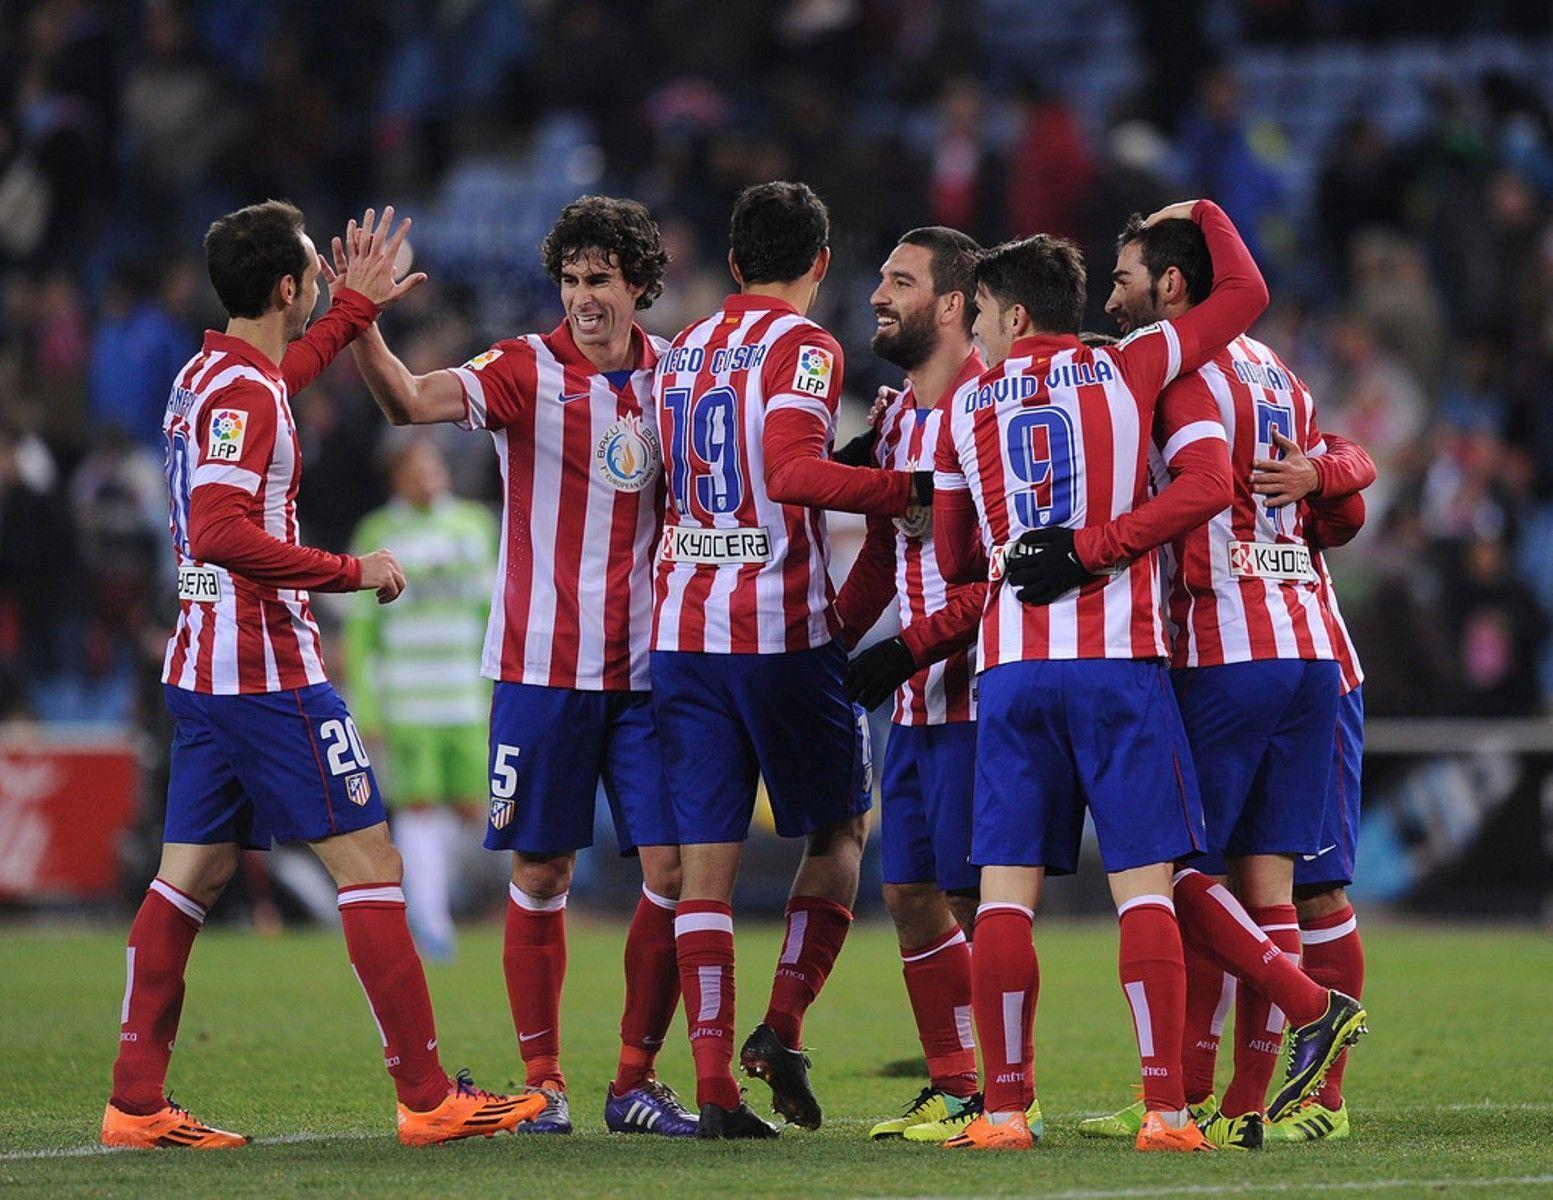 Atletico Madrid 2014 Wallpaper Football Club Atletico Madrid 2014 ...